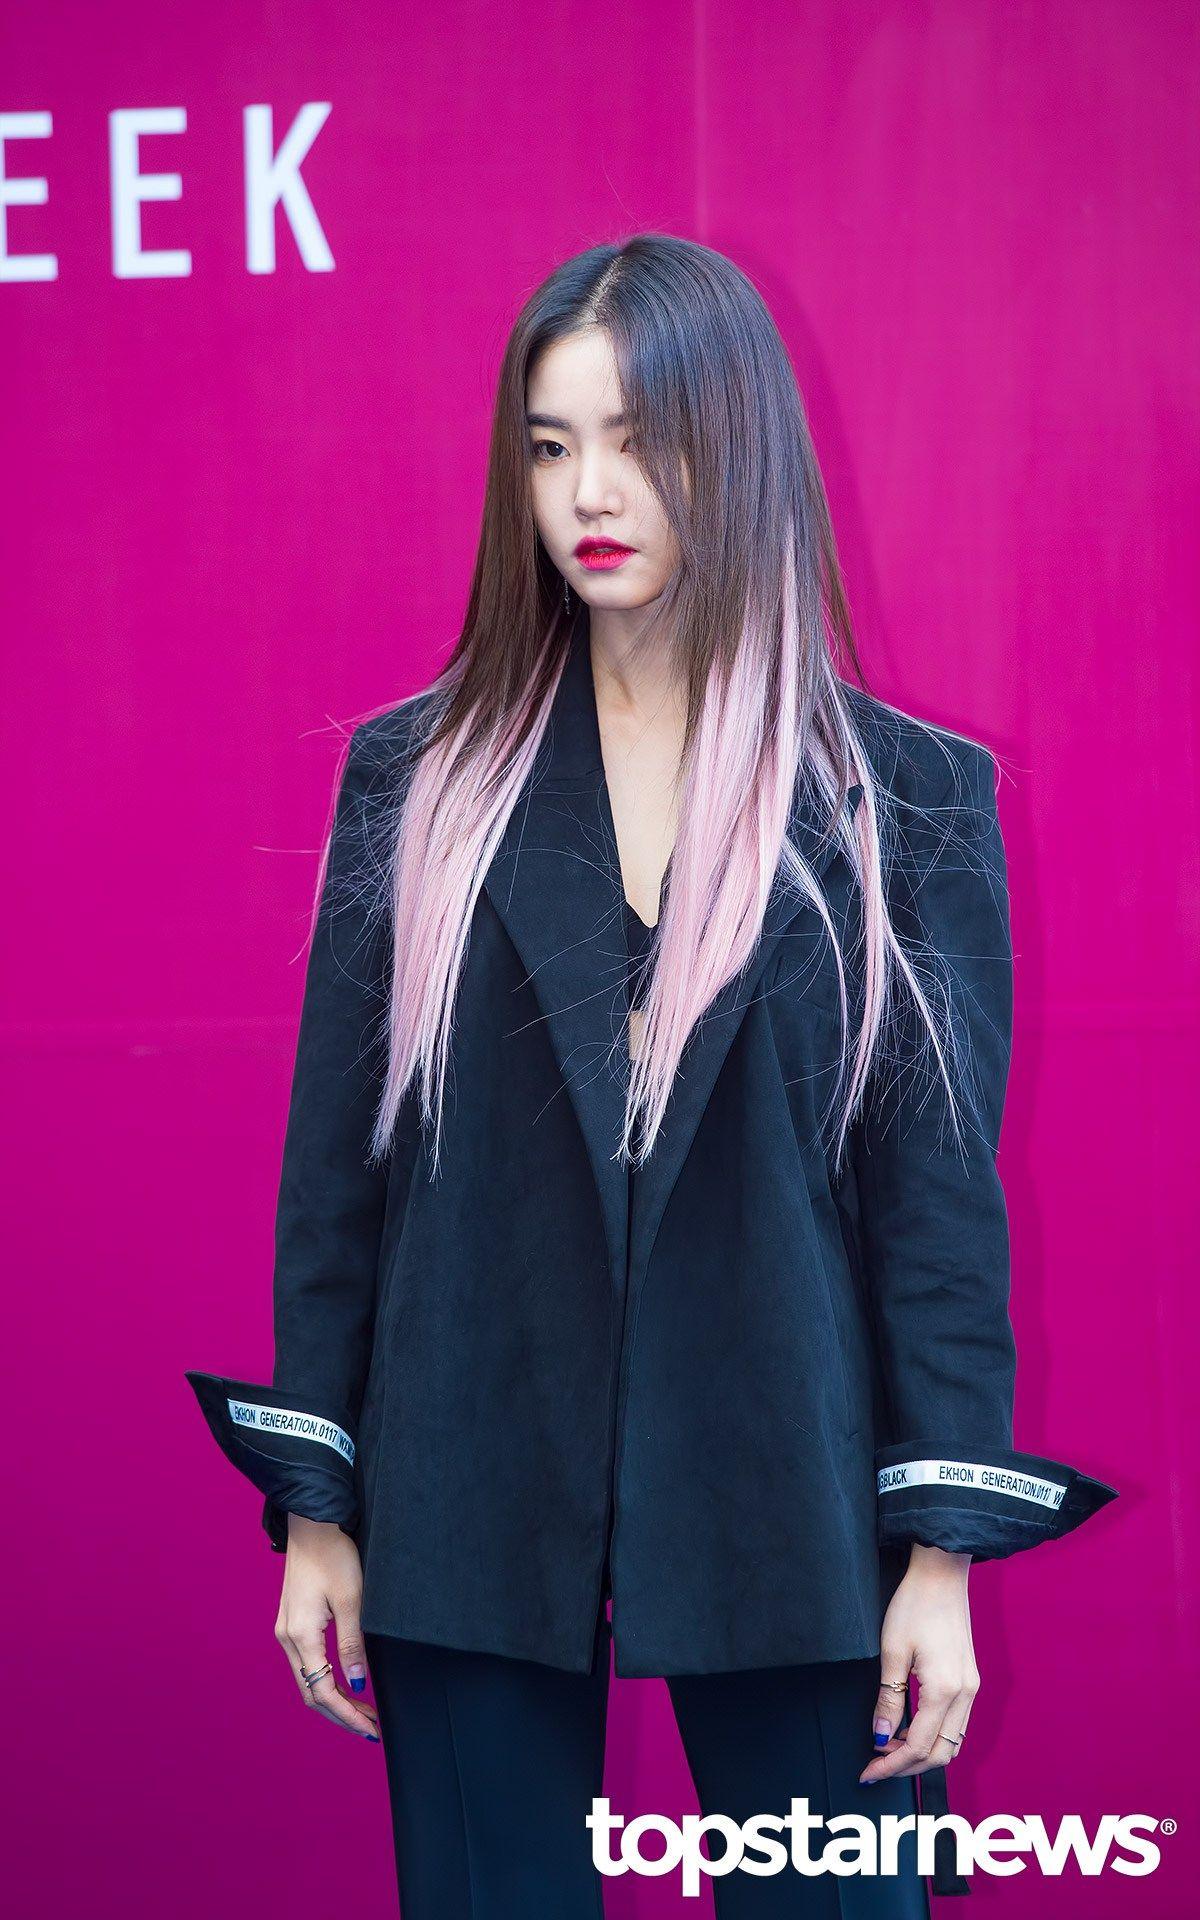 Korea Korean Kpop Idol Girl Group Band Kdrama Actress Hwang Seung Un S Two Tone Hair Pink Pastel Ends Dip Dye Ha Korean Hair Color Korean Hairstyle Pastel Hair